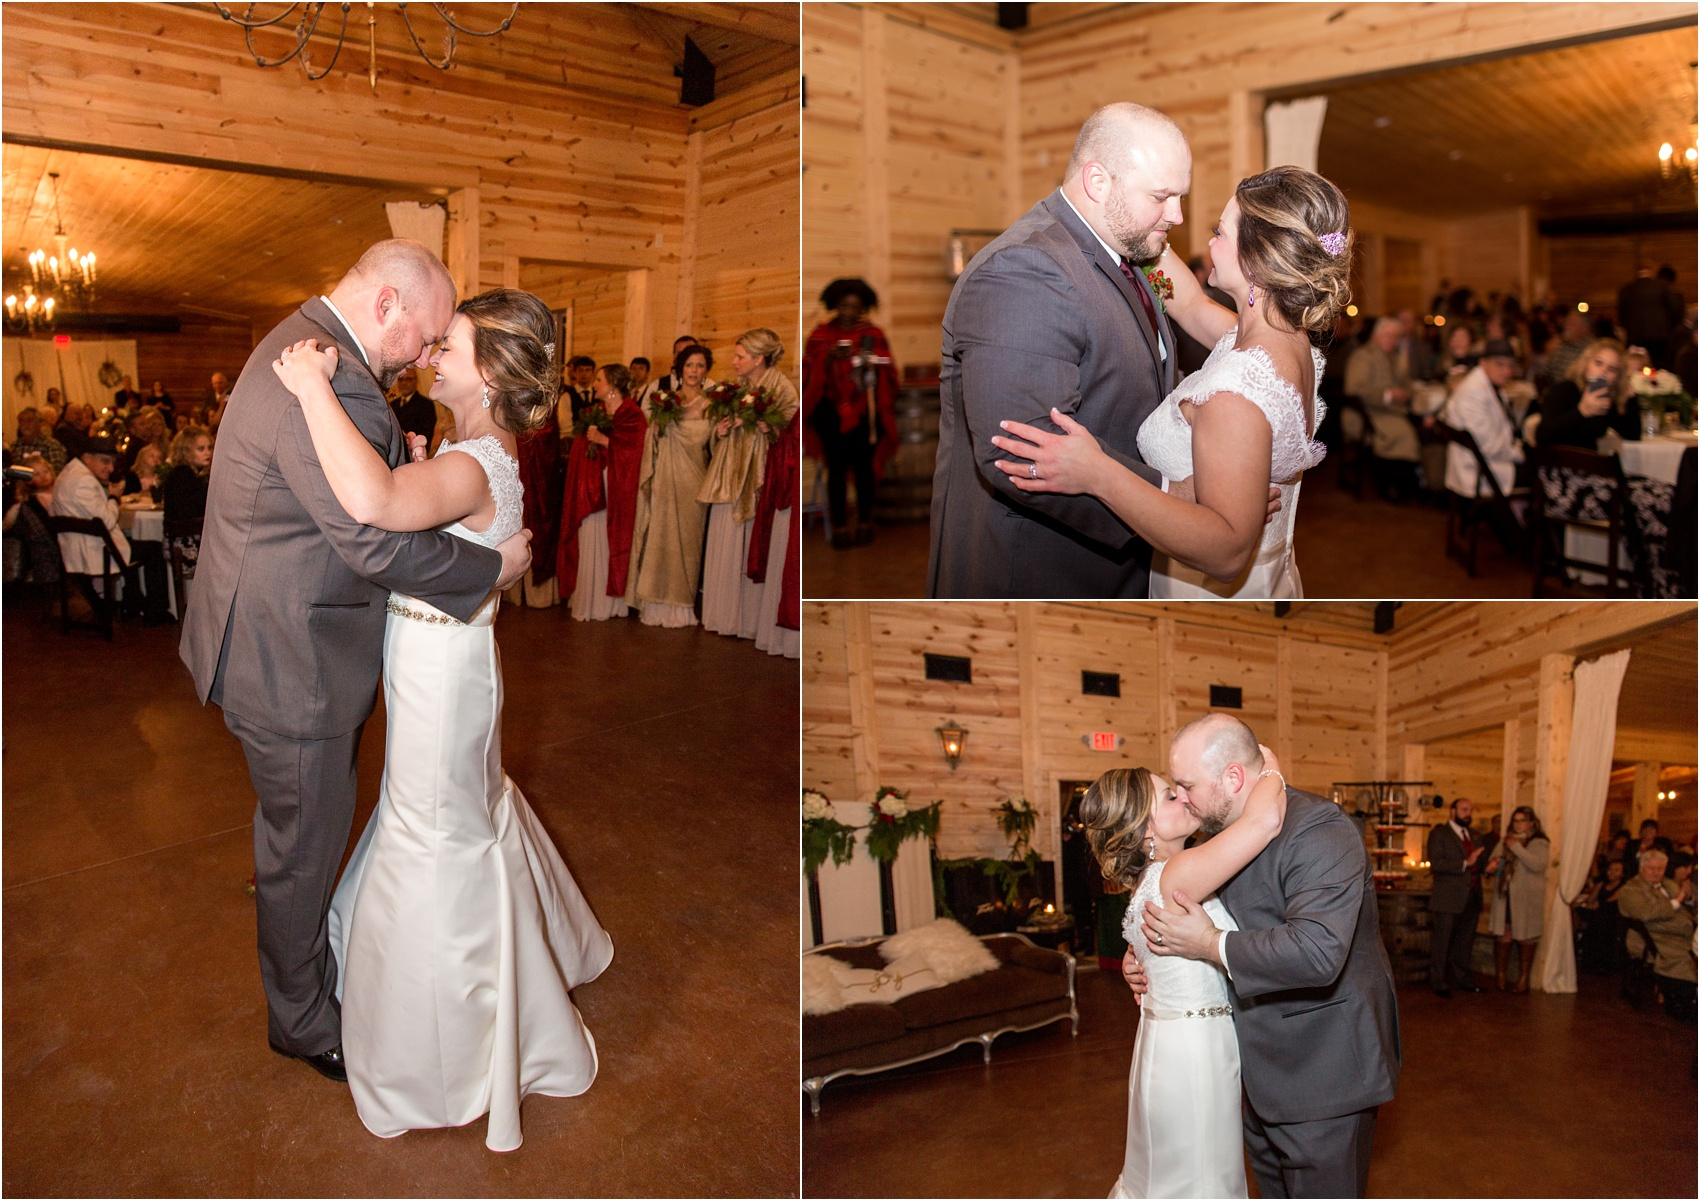 Savannah Eve Photography- Page Wedding Blog-80.jpg